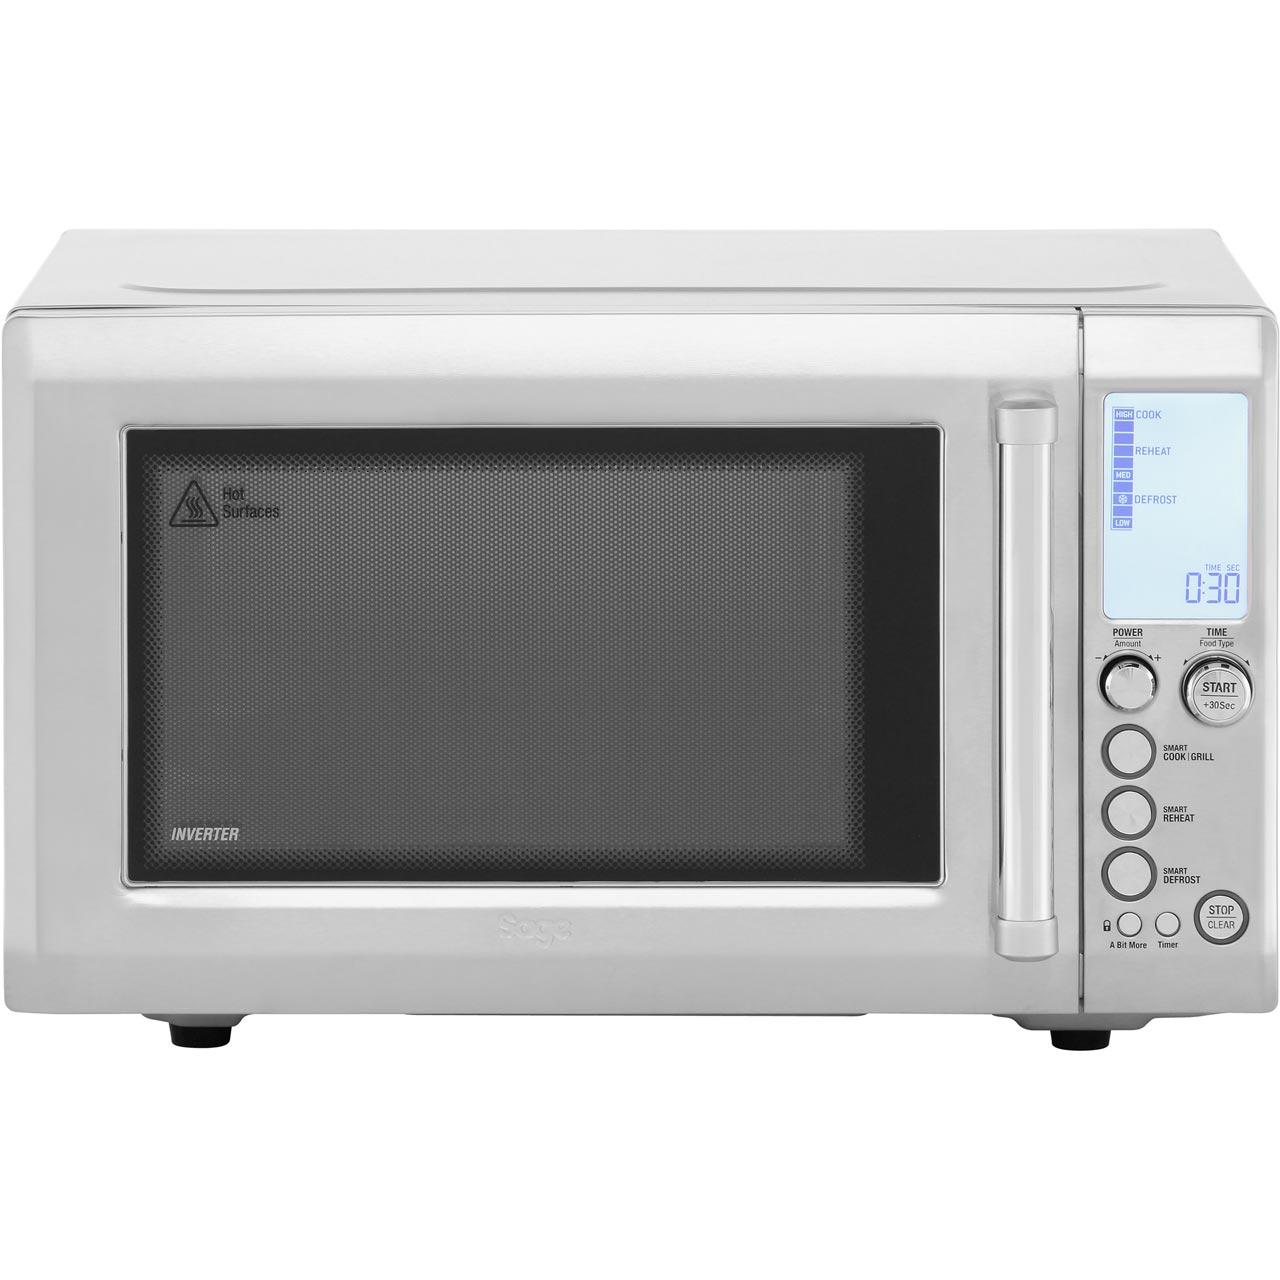 Sage Bmo700bss The Quick Touch Crisp 1000 Watt Microwave